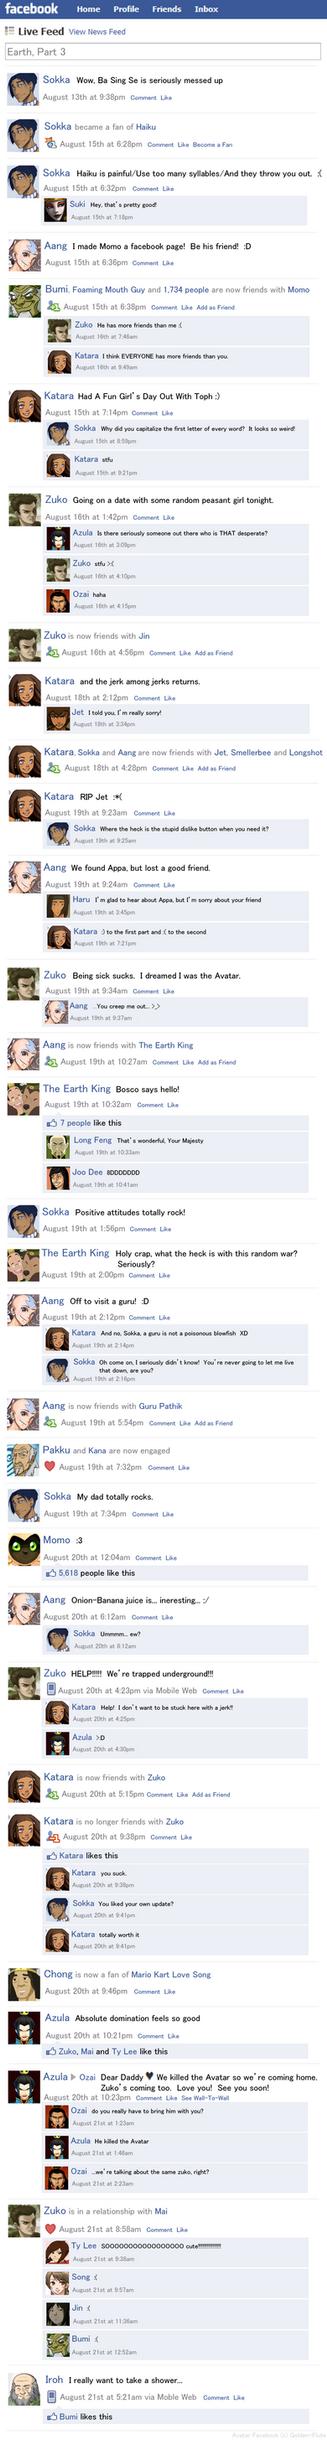 Avatar Facebook Earth Part 3 by Golden-Flute